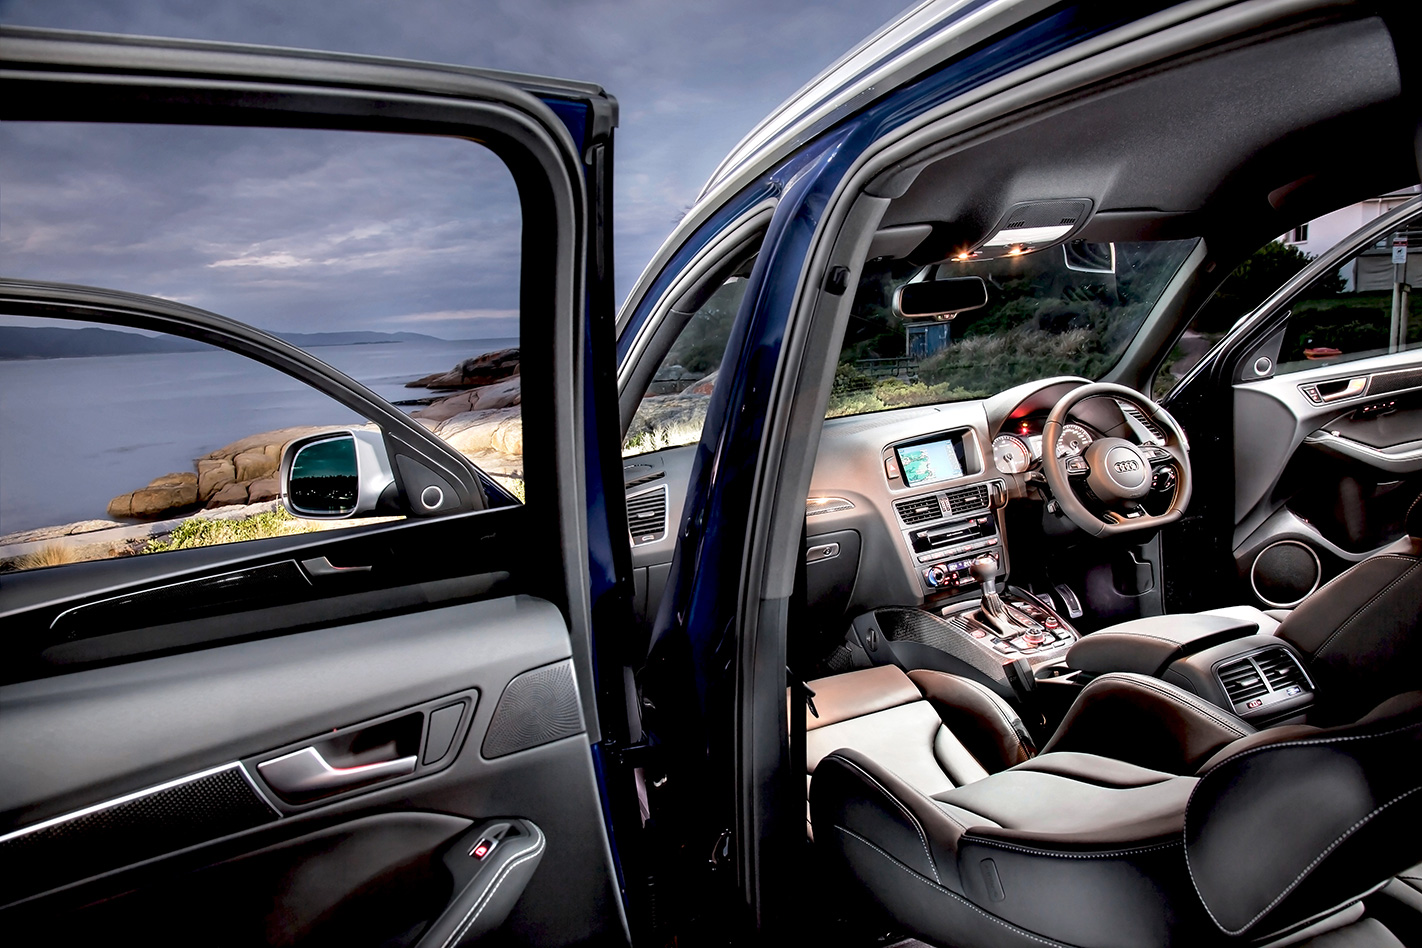 Audi SQ5 interior.jpg